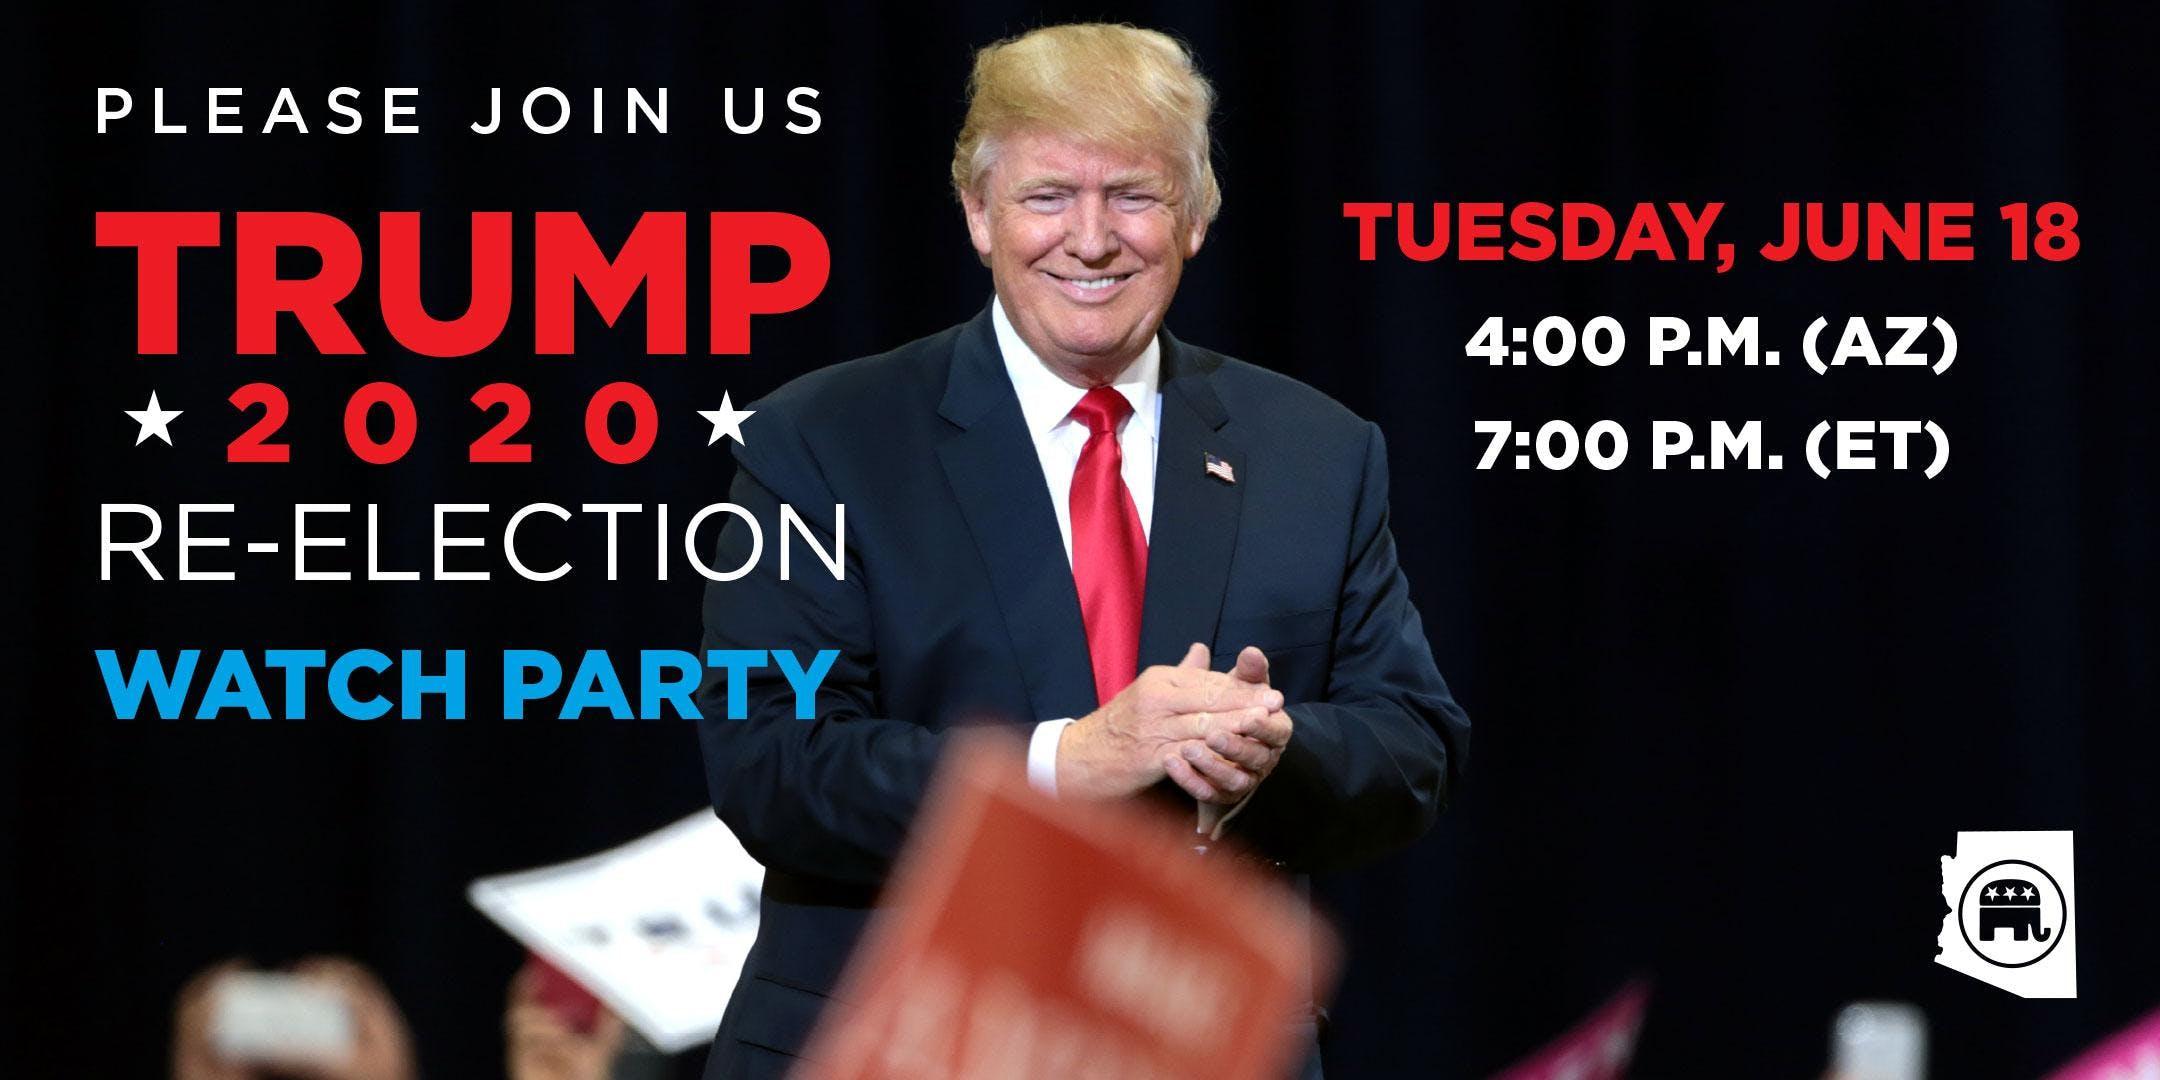 Trump 2020 Re-Election Watch Party (RPAZ Phoenix Headquarters)